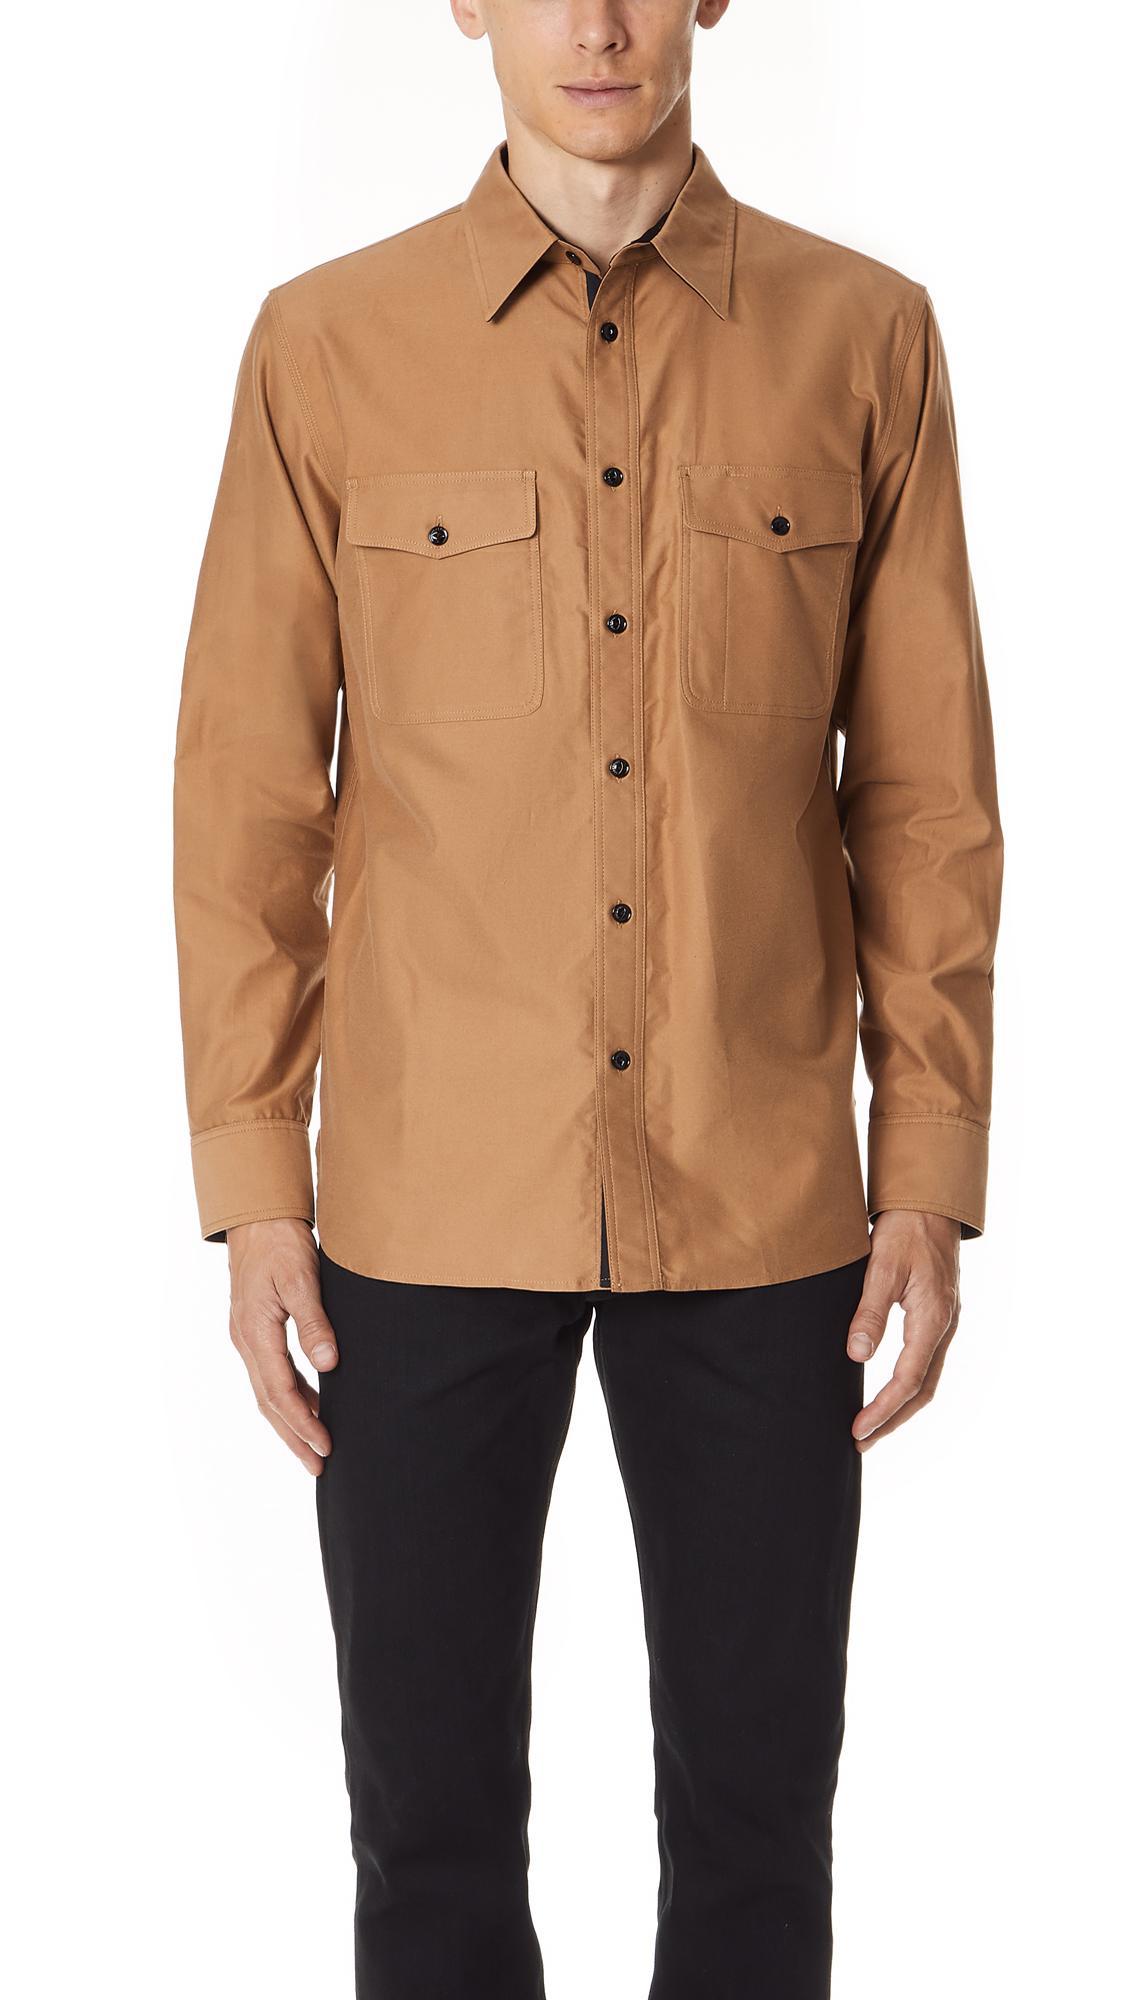 Rag & Bone Jack Shirt In Cream